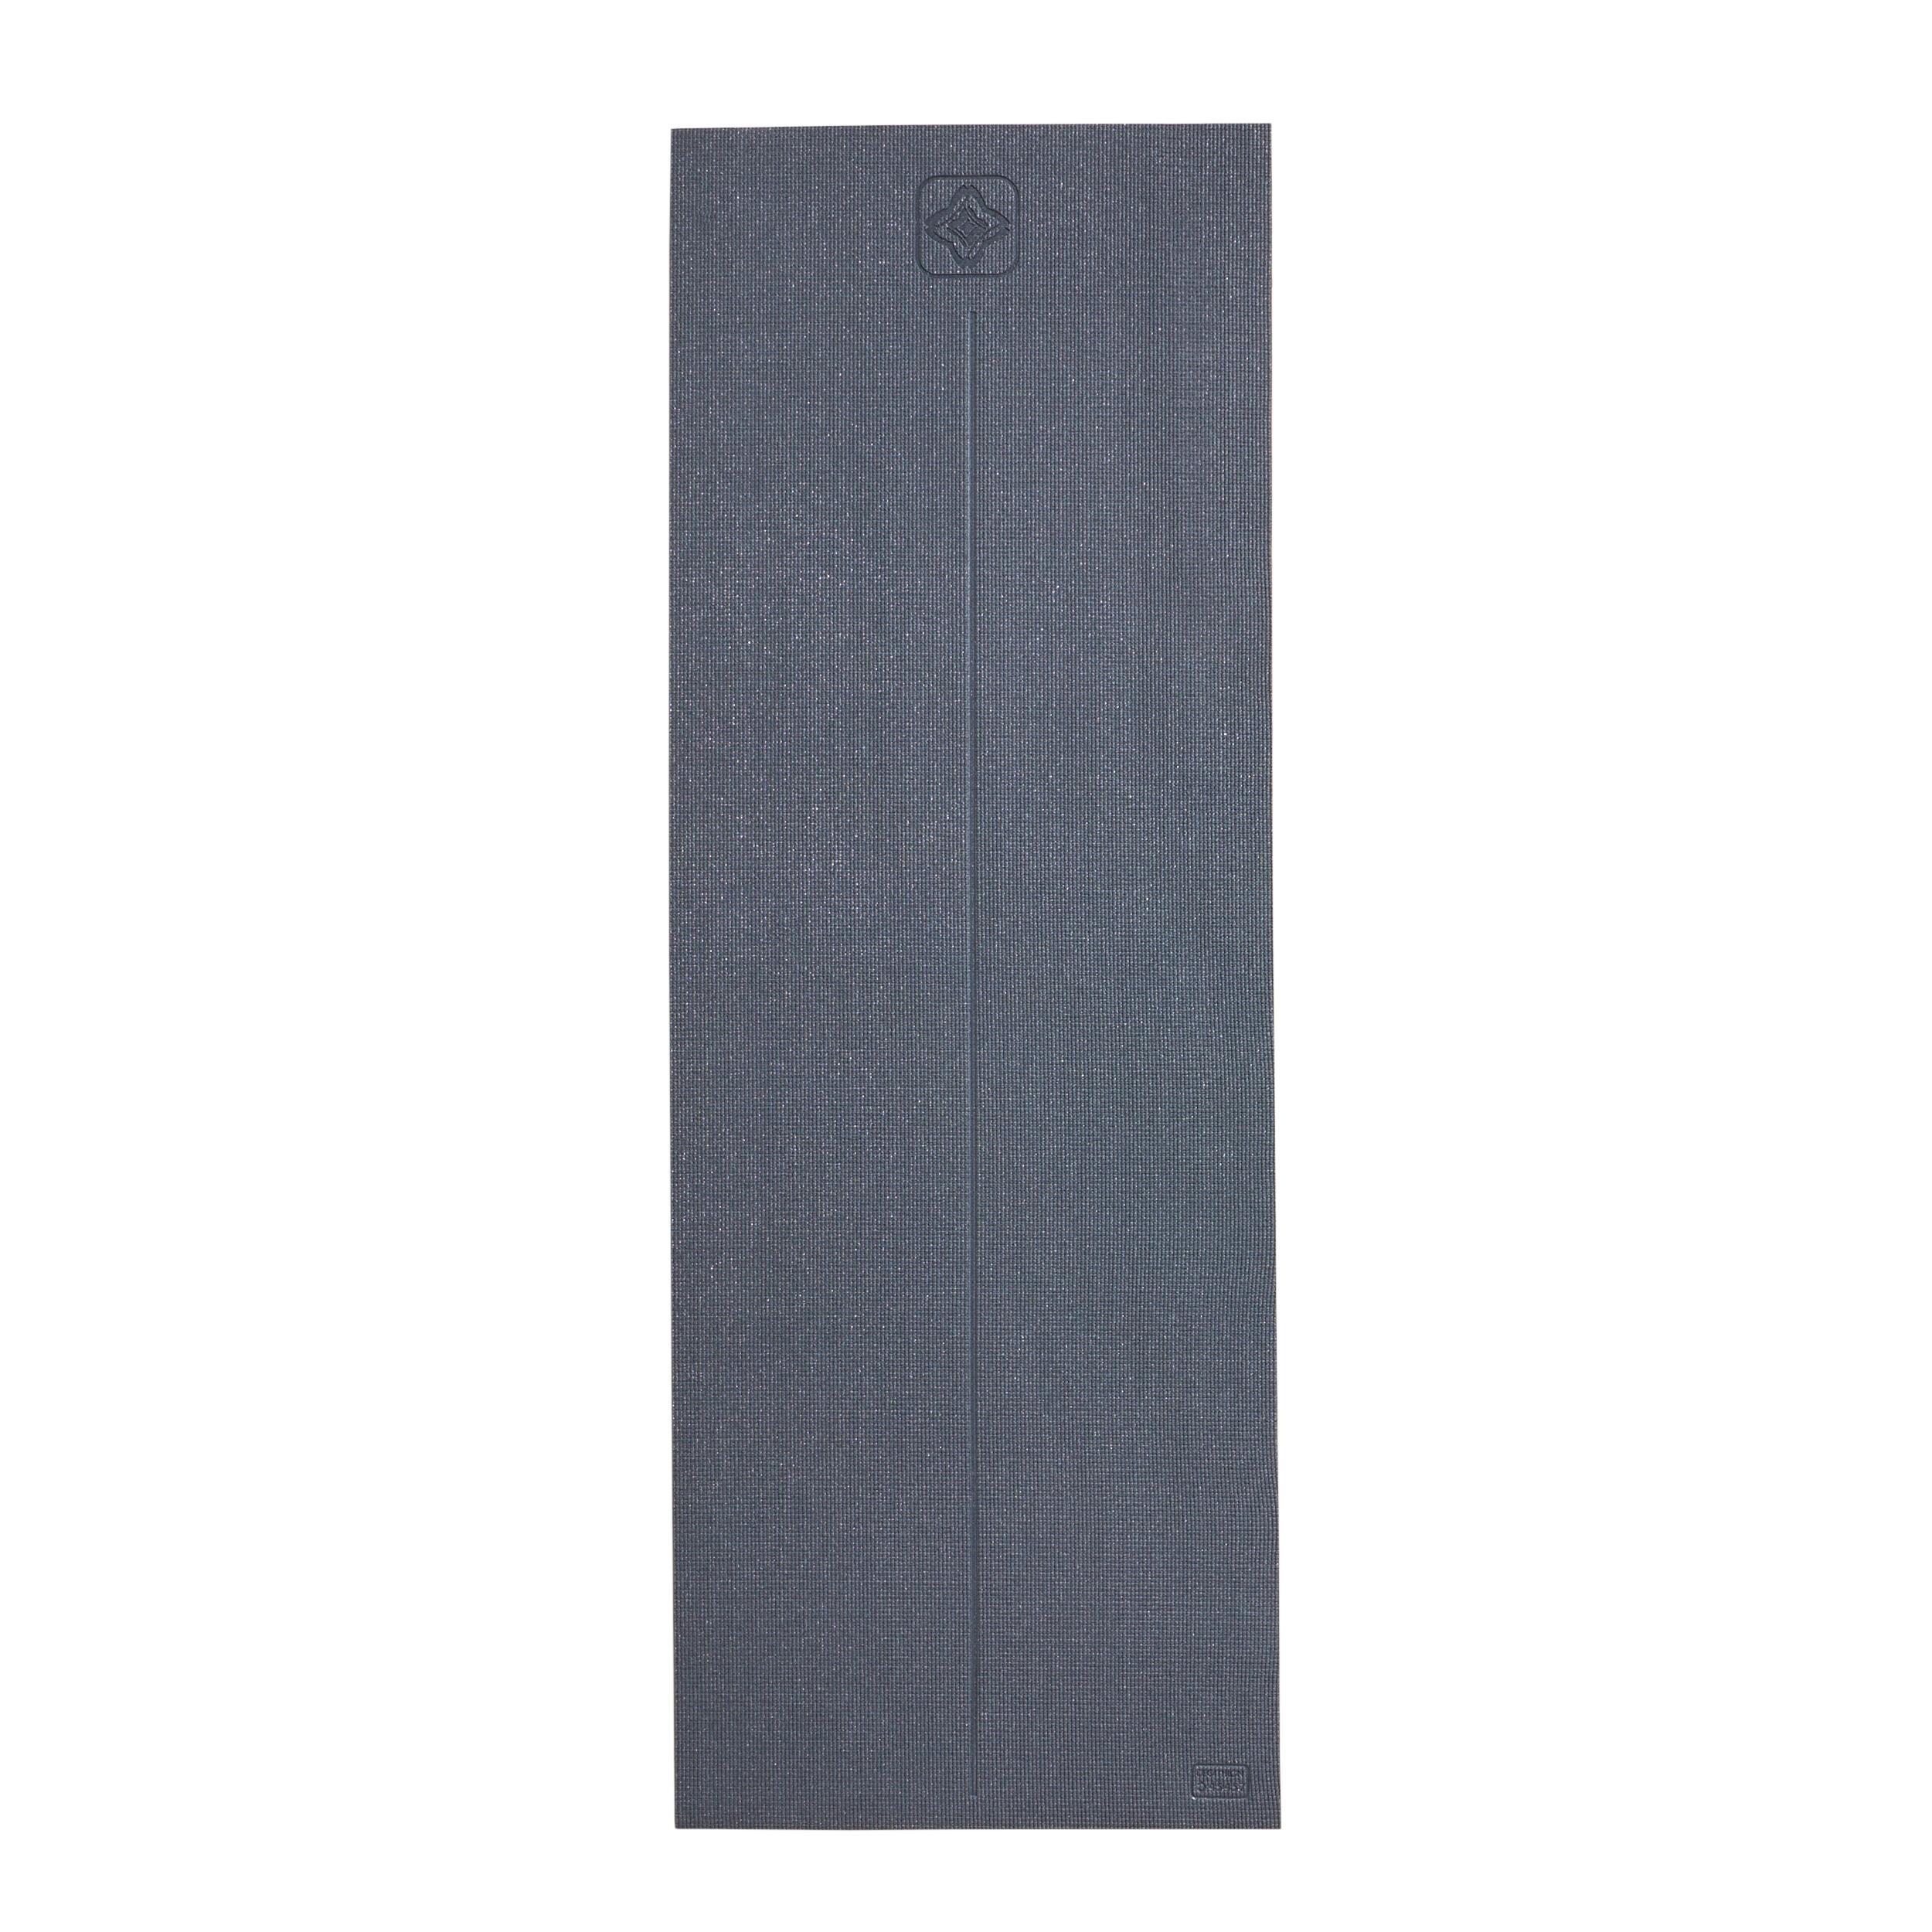 kimjaly tappetino yoga comfort 8 mm grigio 173x61cm